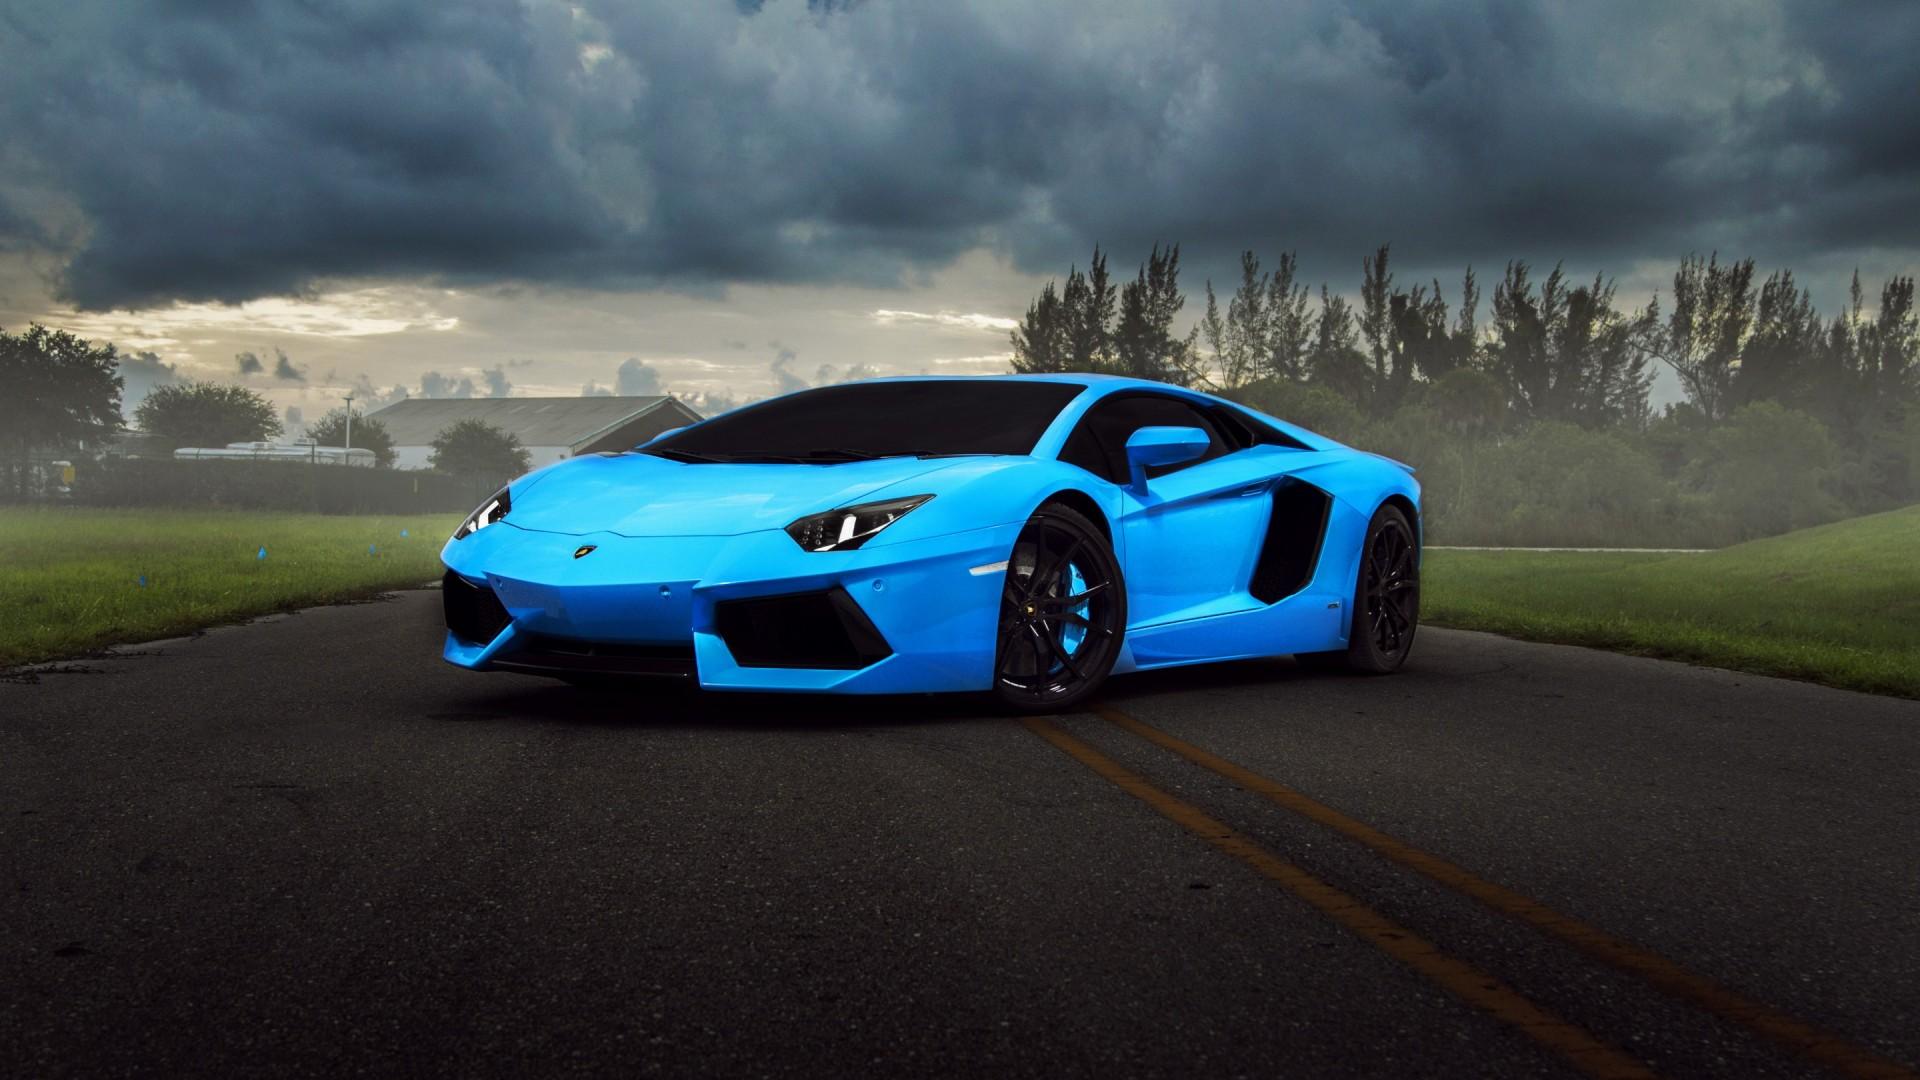 Lamborghini Aventador Spyder >> Supercars HD Wallpapers 1080p - WallpaperSafari